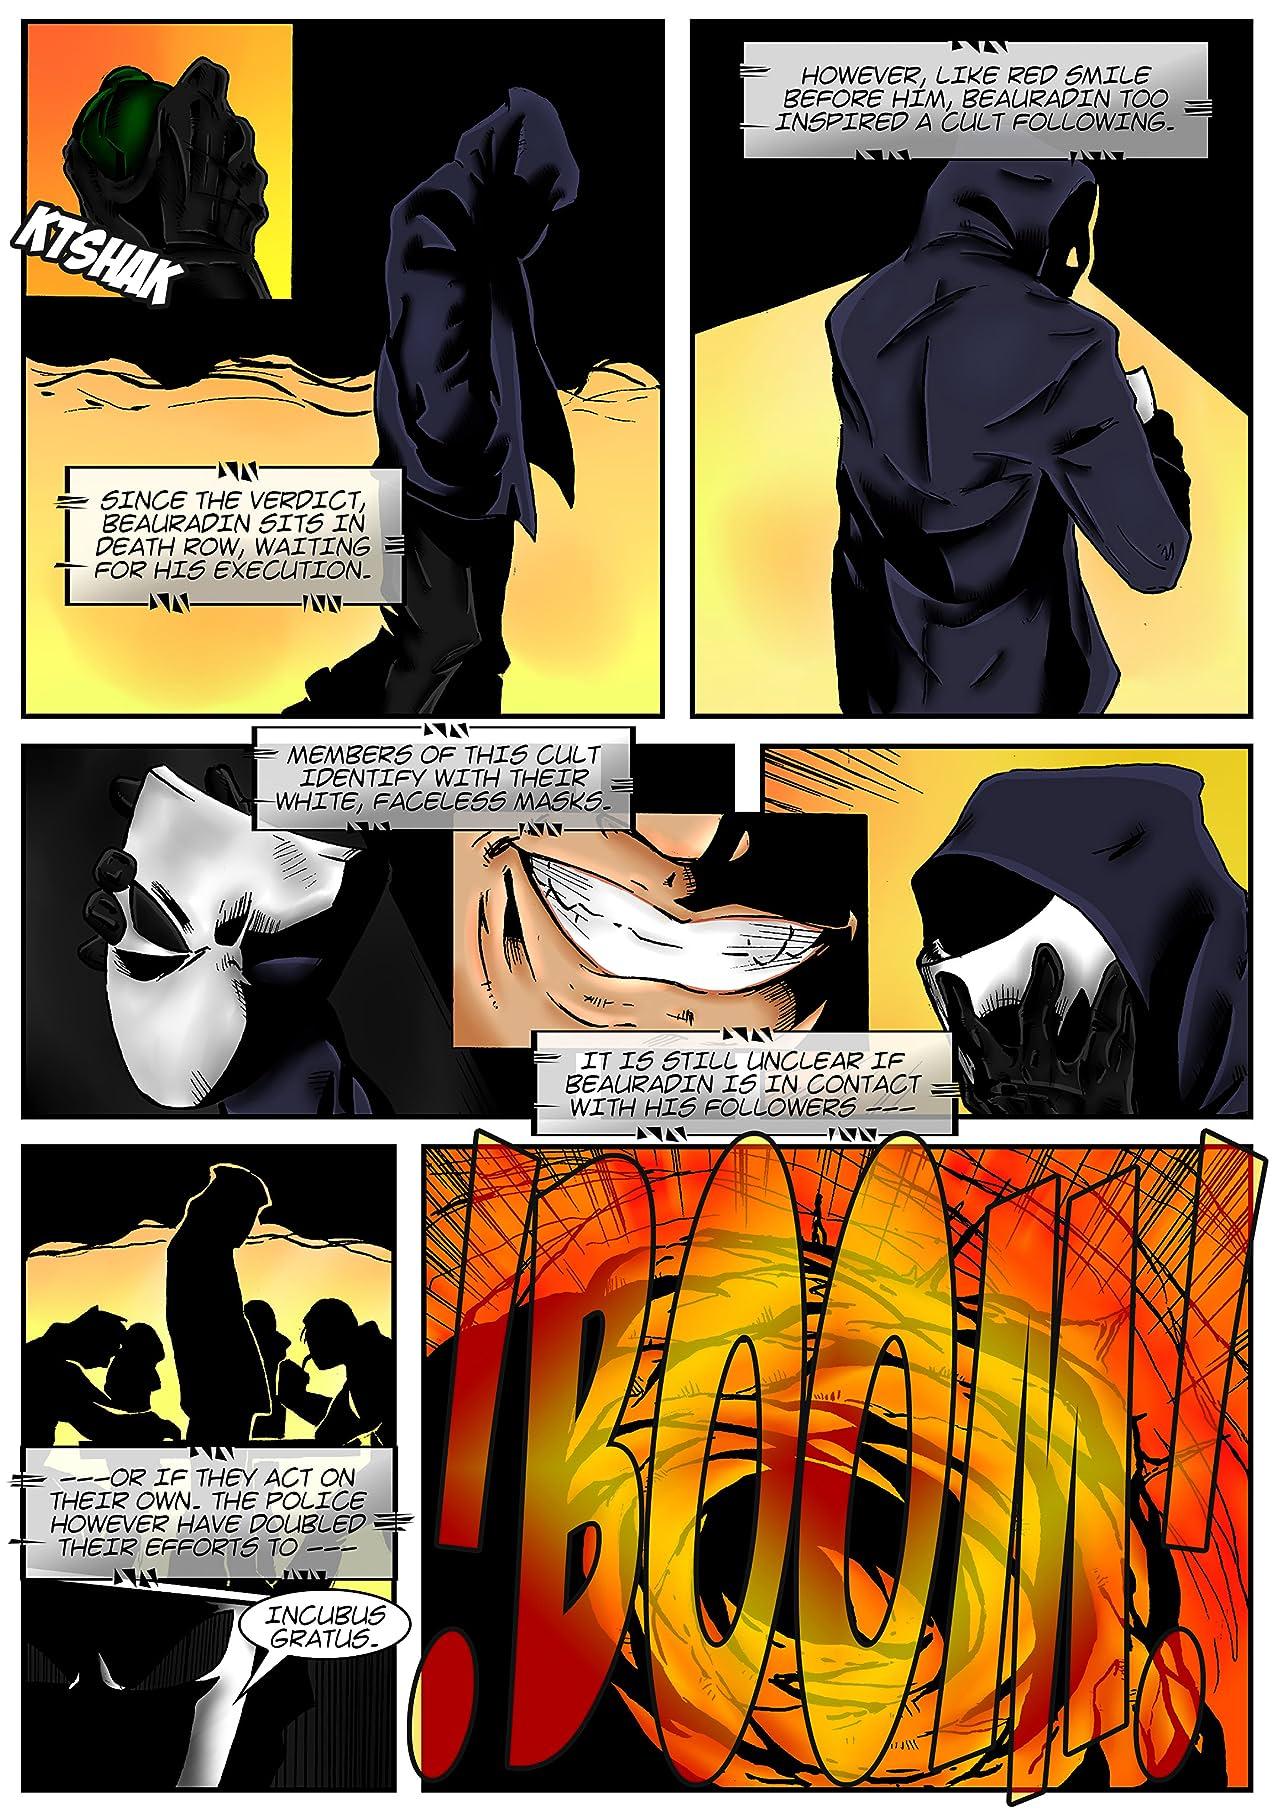 Psypher #1